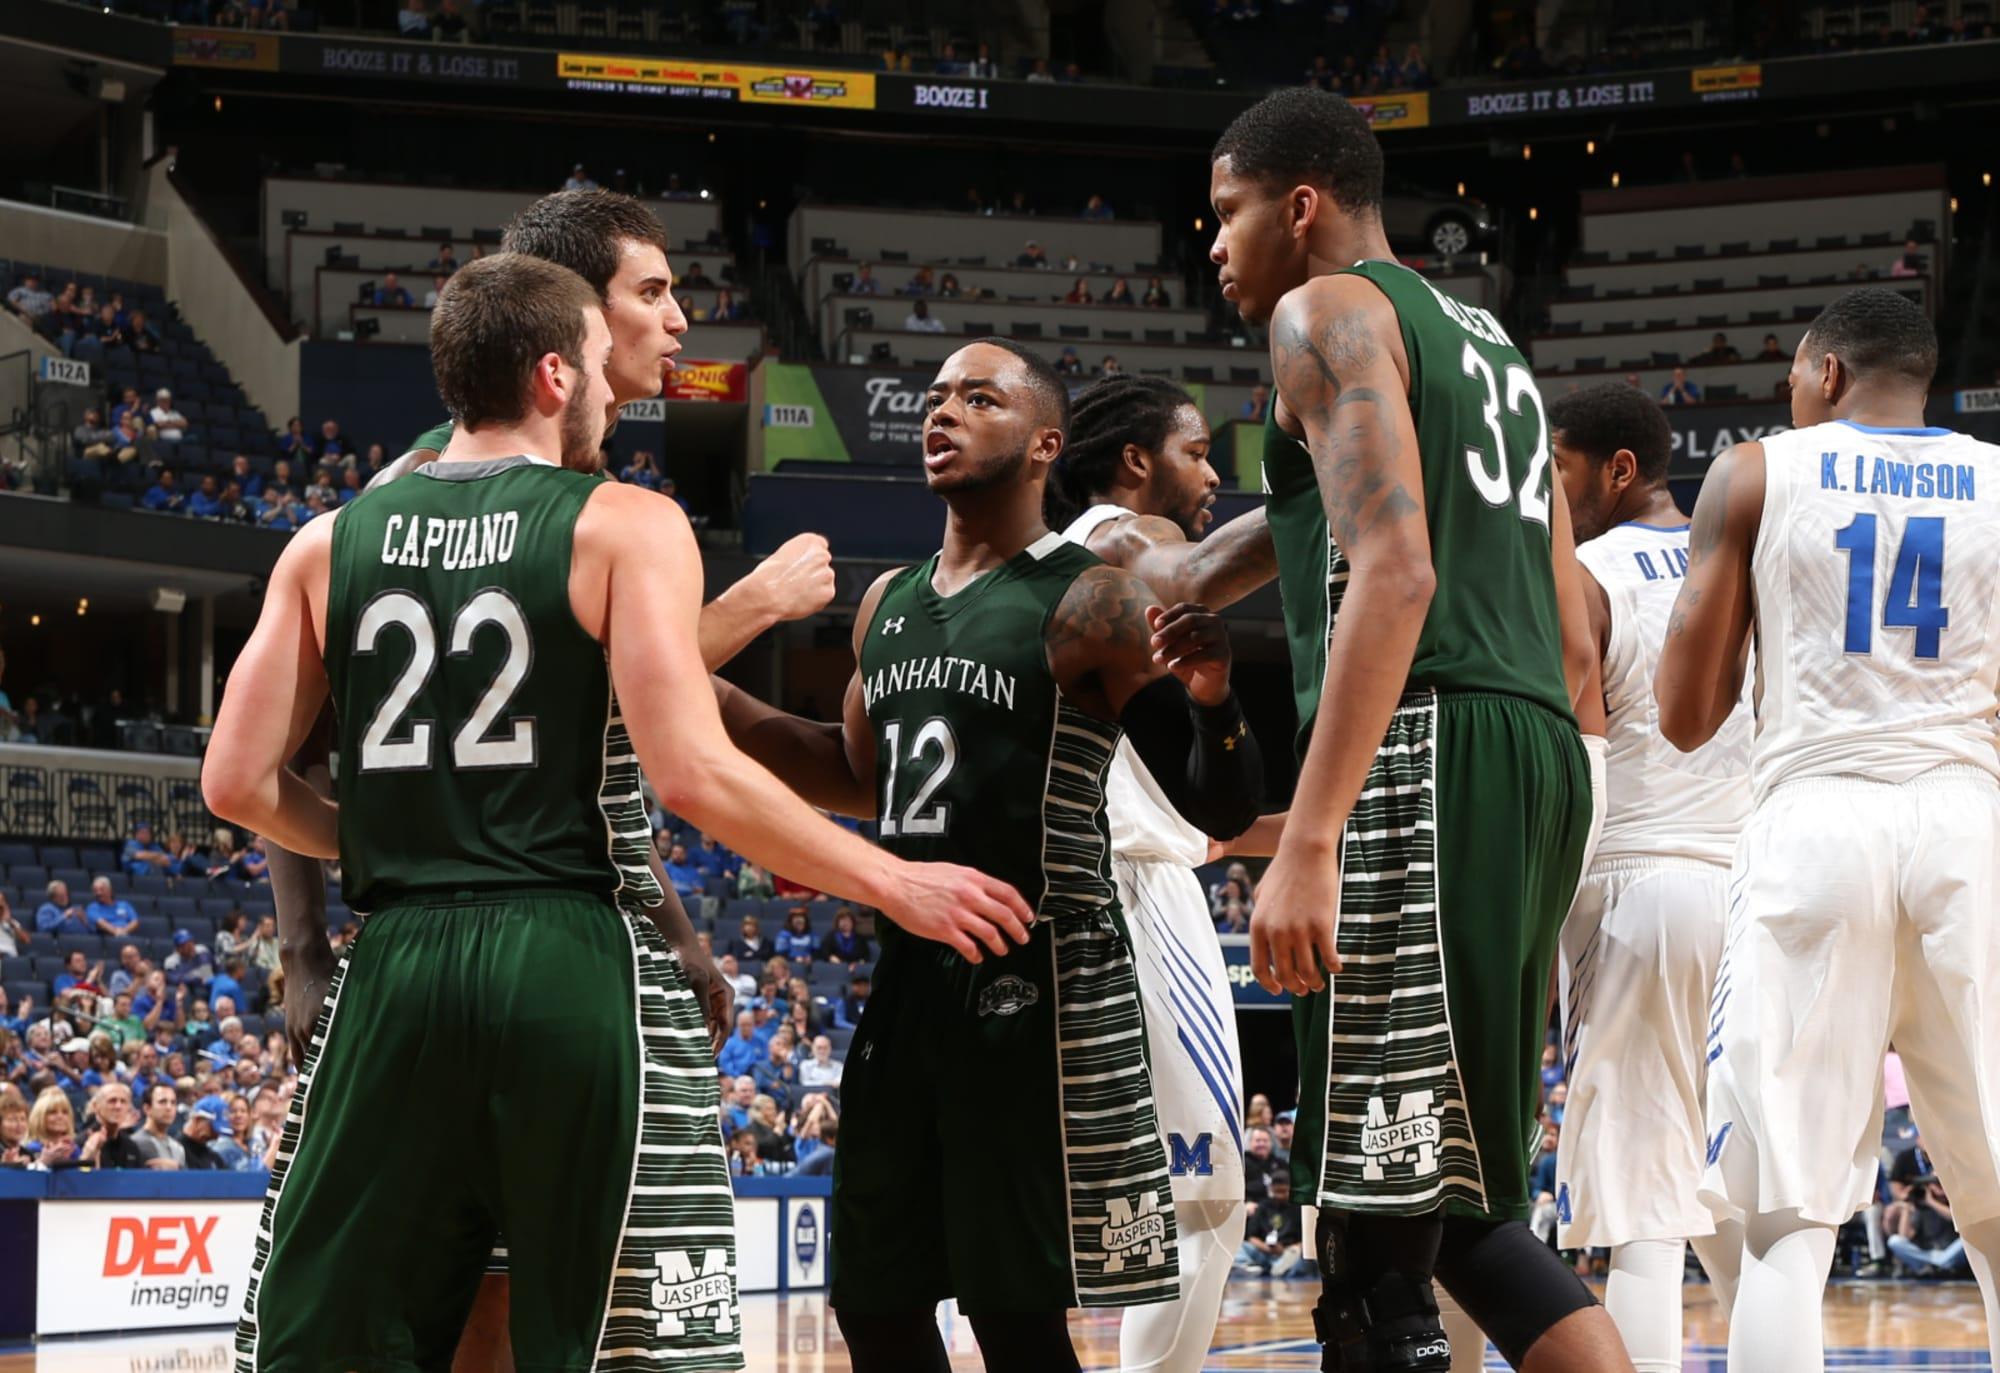 NCAA Basketball: 6 teams that should target Manhattan transfer Pauly Paulicap